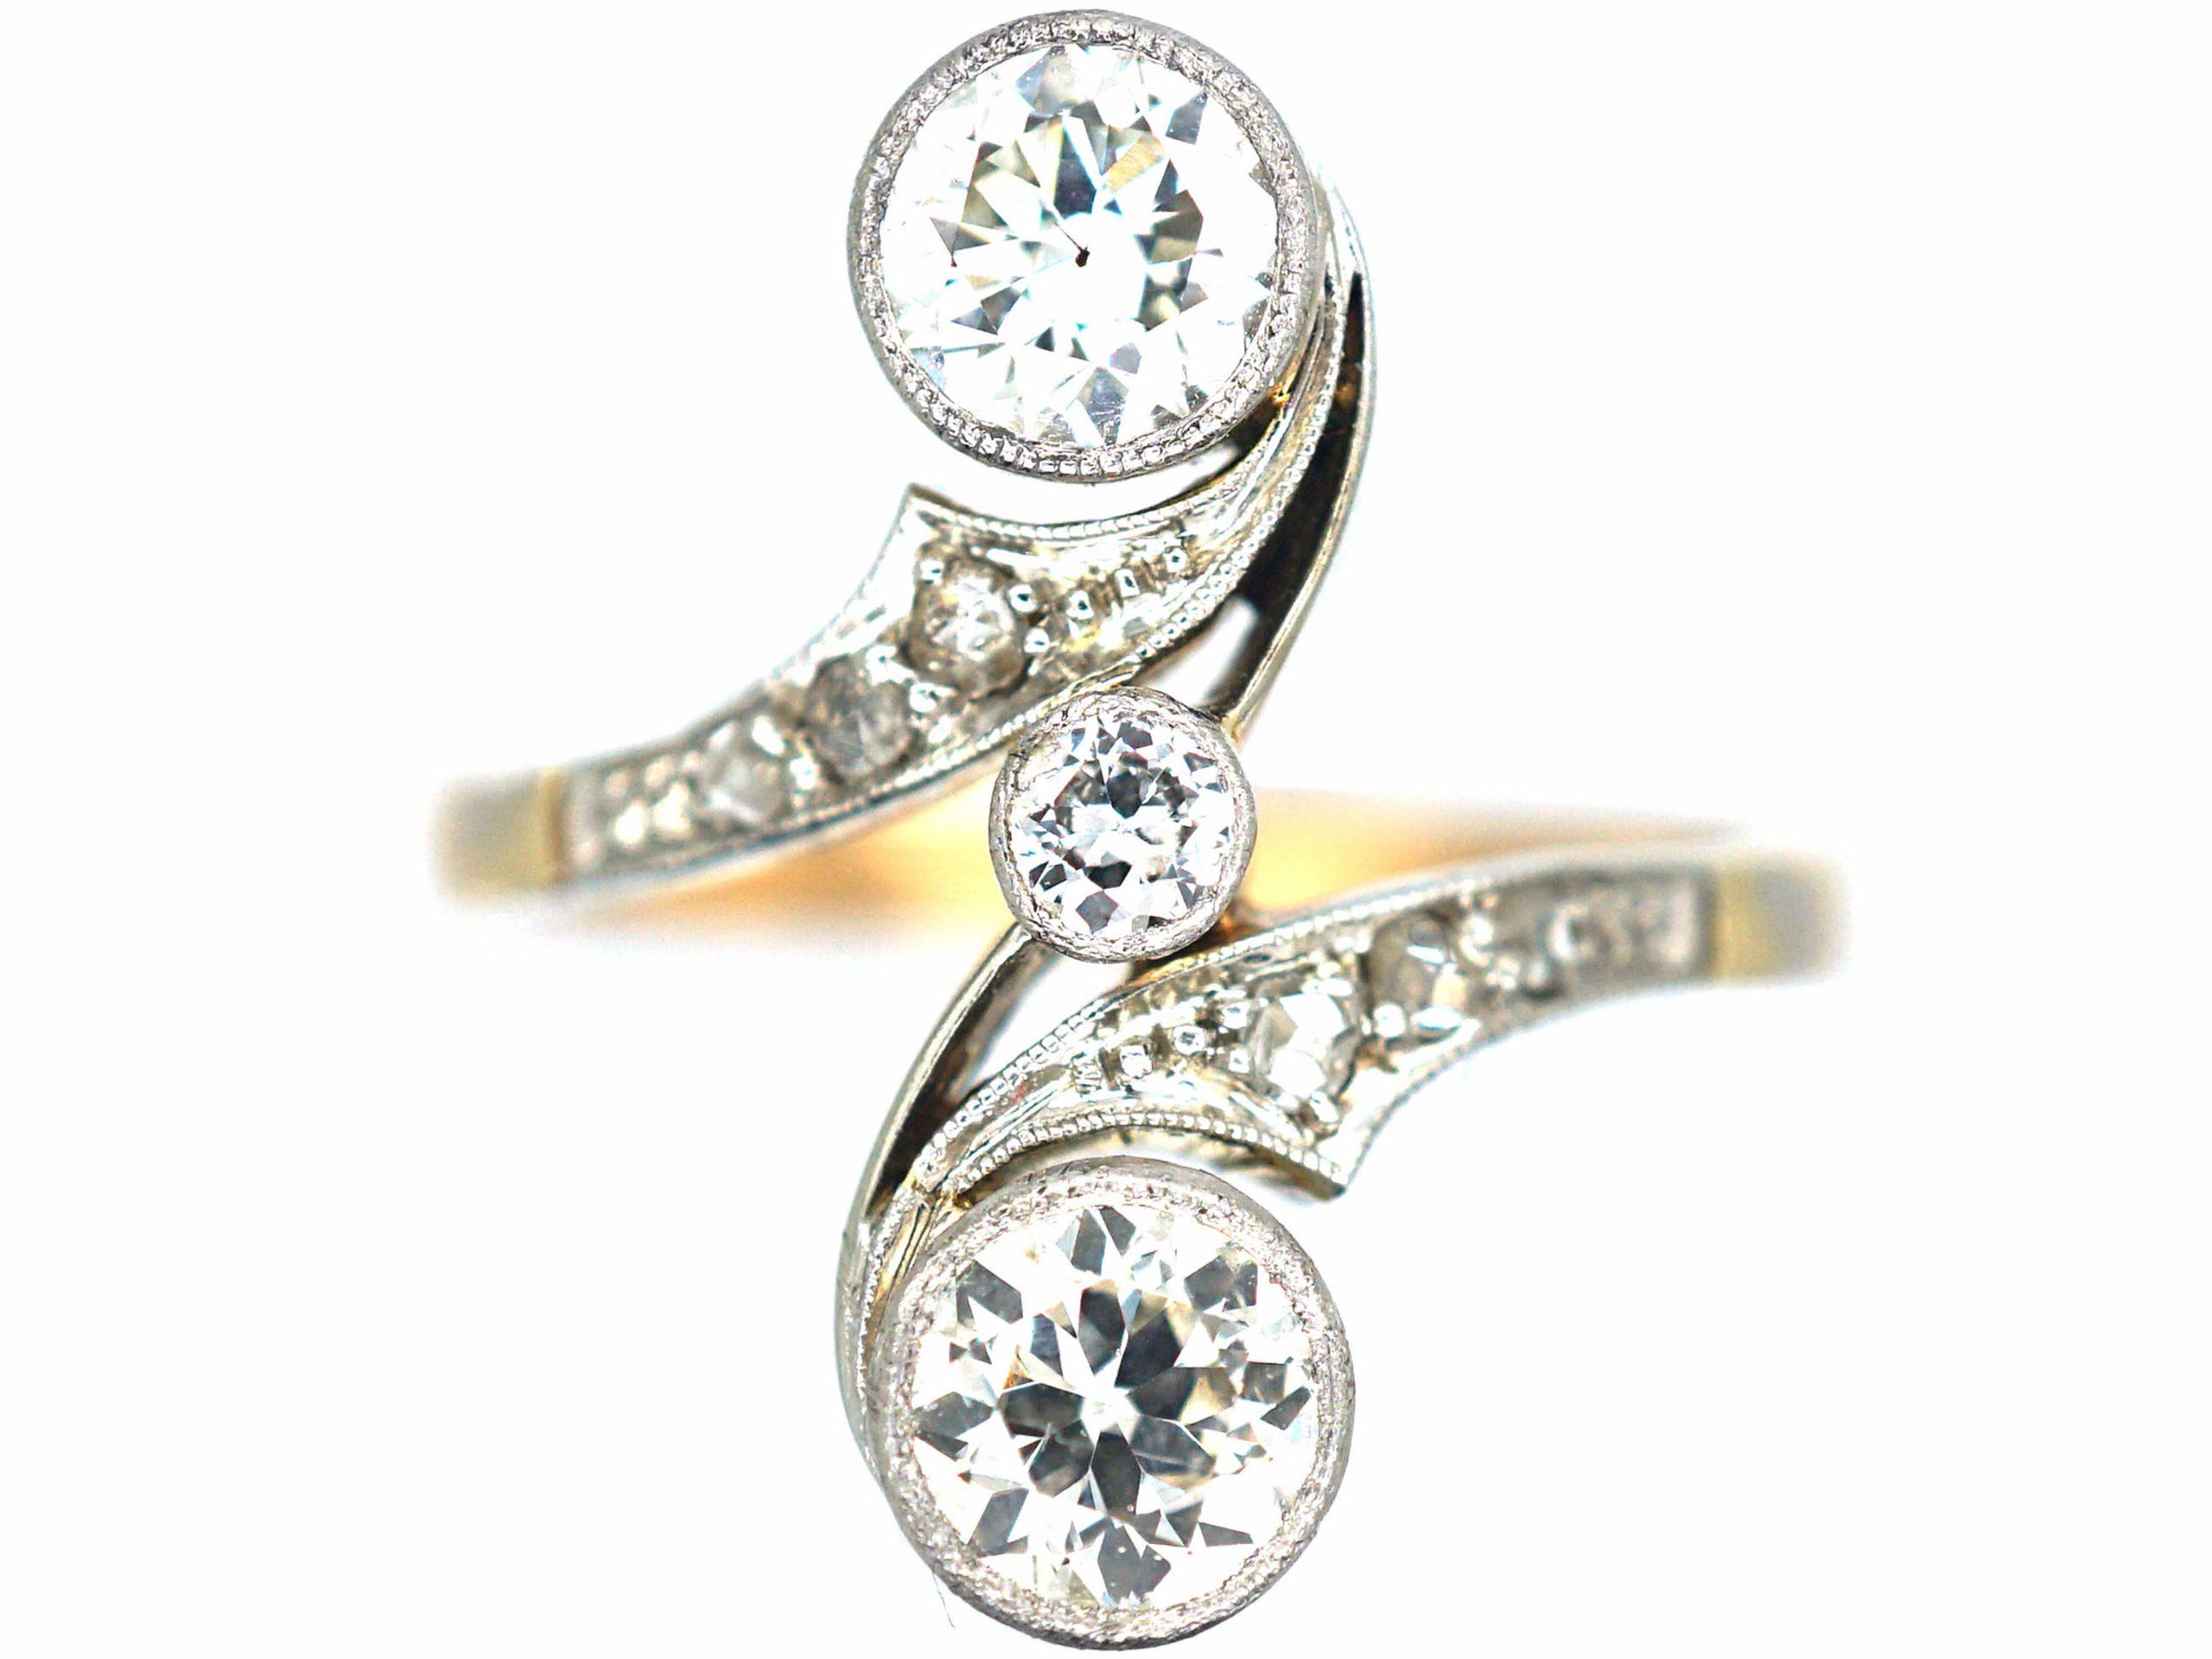 French 18ct Gold & Platinum Art Nouveau Two Stone Diamond Ring